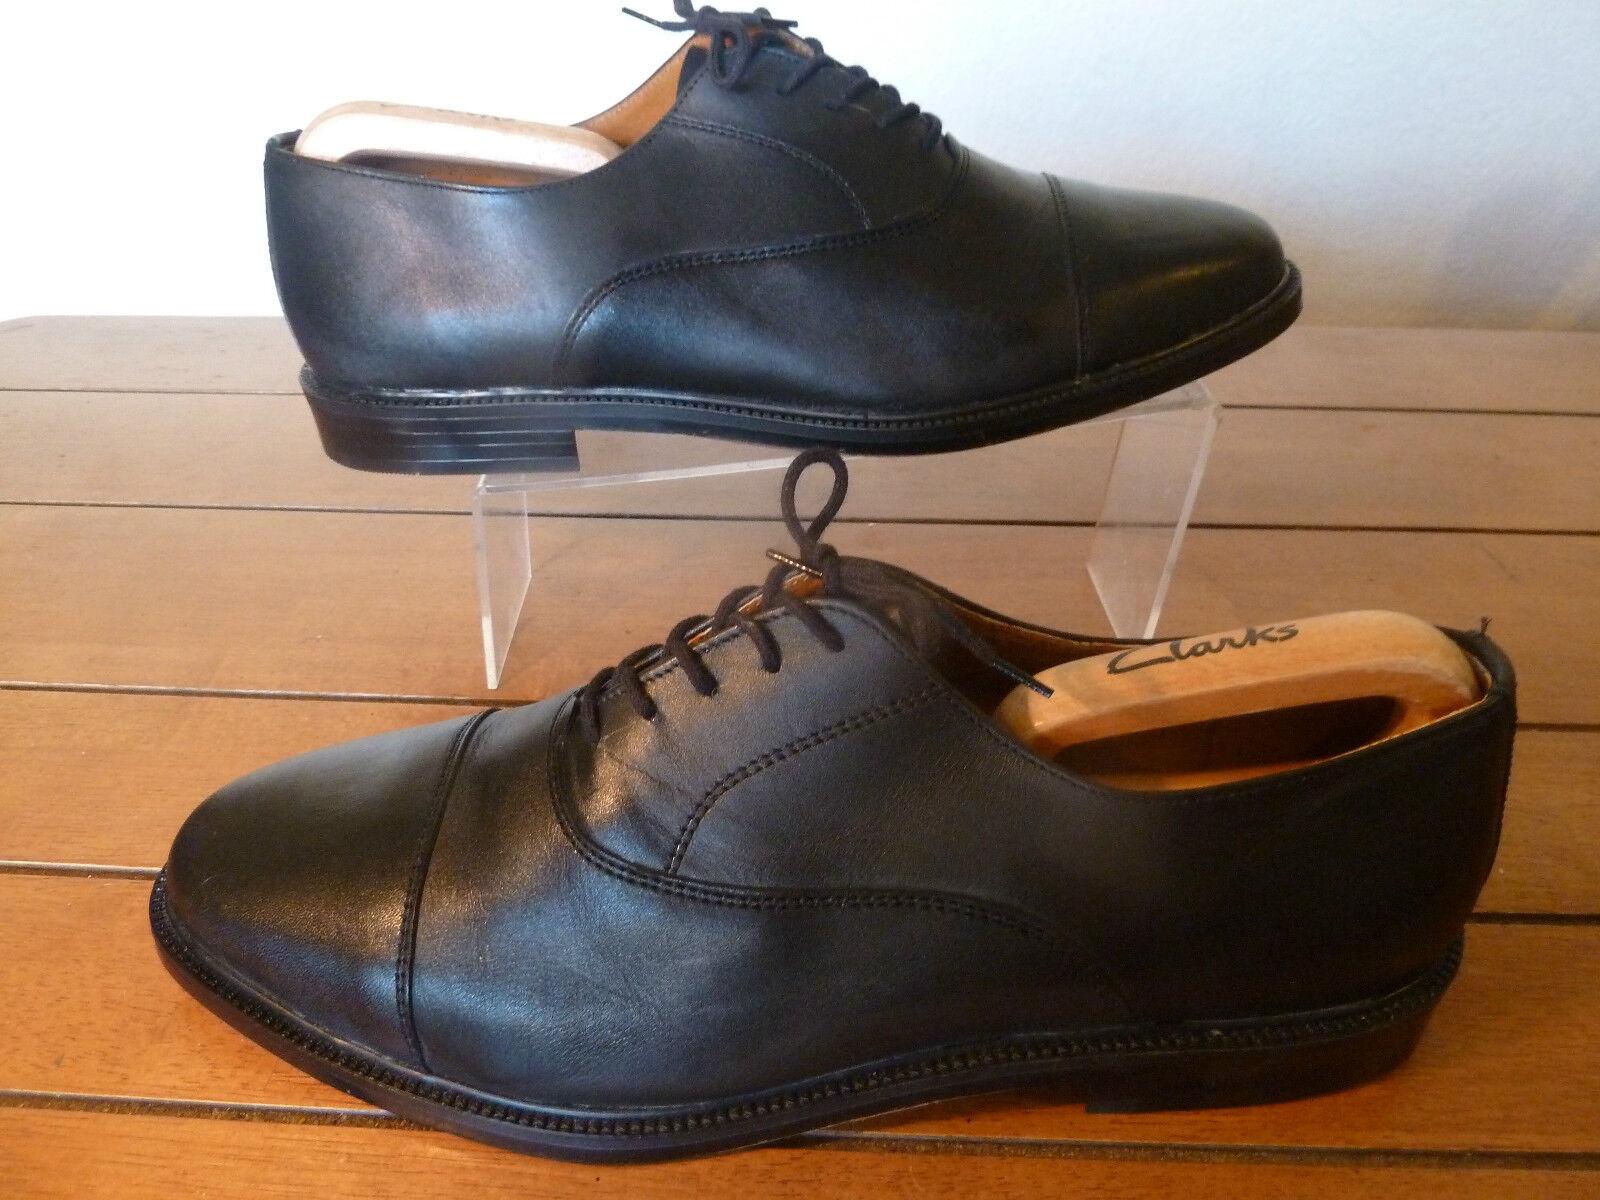 Mens RICHARD YORKE leather derby brogues - size uk 12 BNWOB